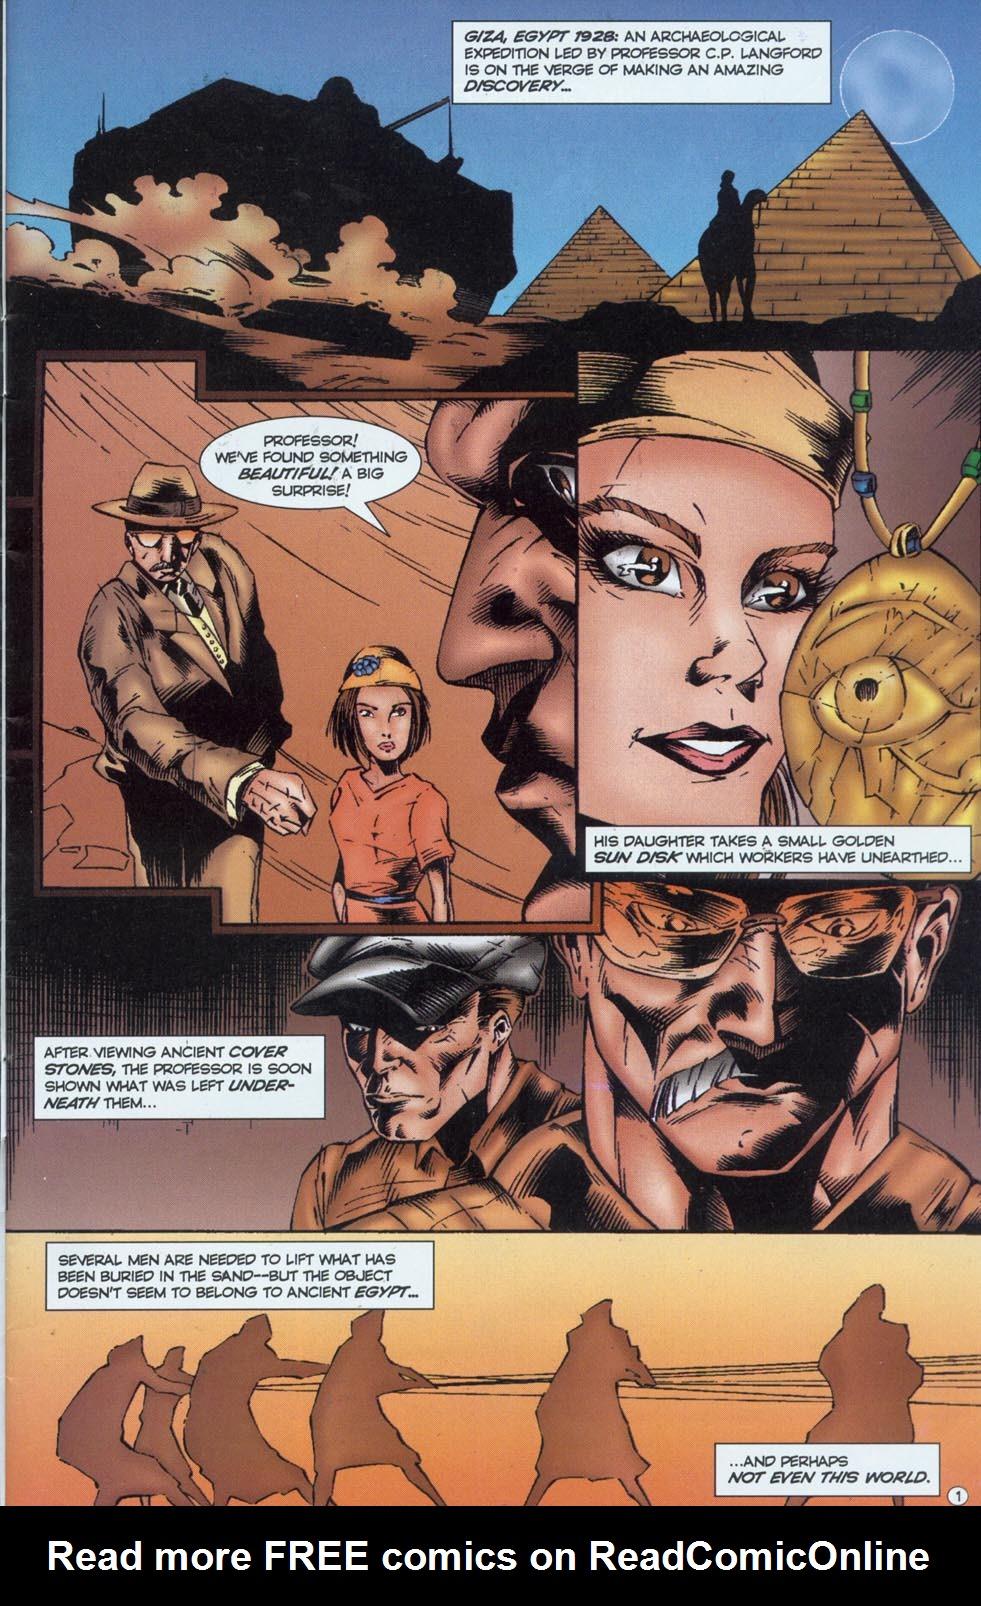 Read online Stargate comic -  Issue #1 - 3